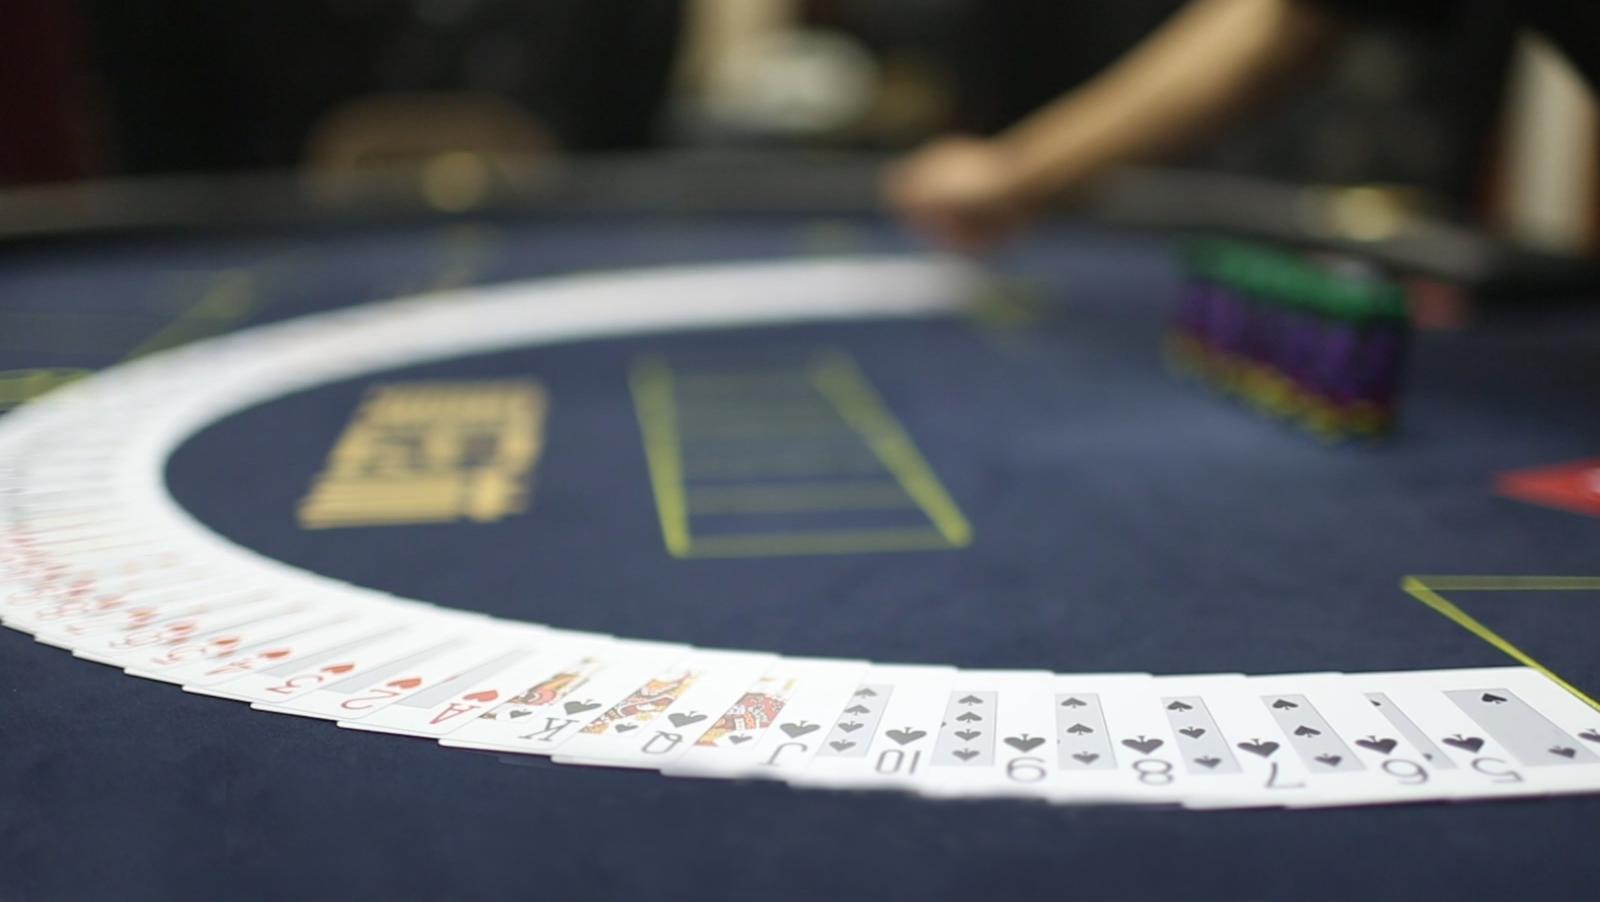 Philippine audit agency flags Landing International casino land lease deal